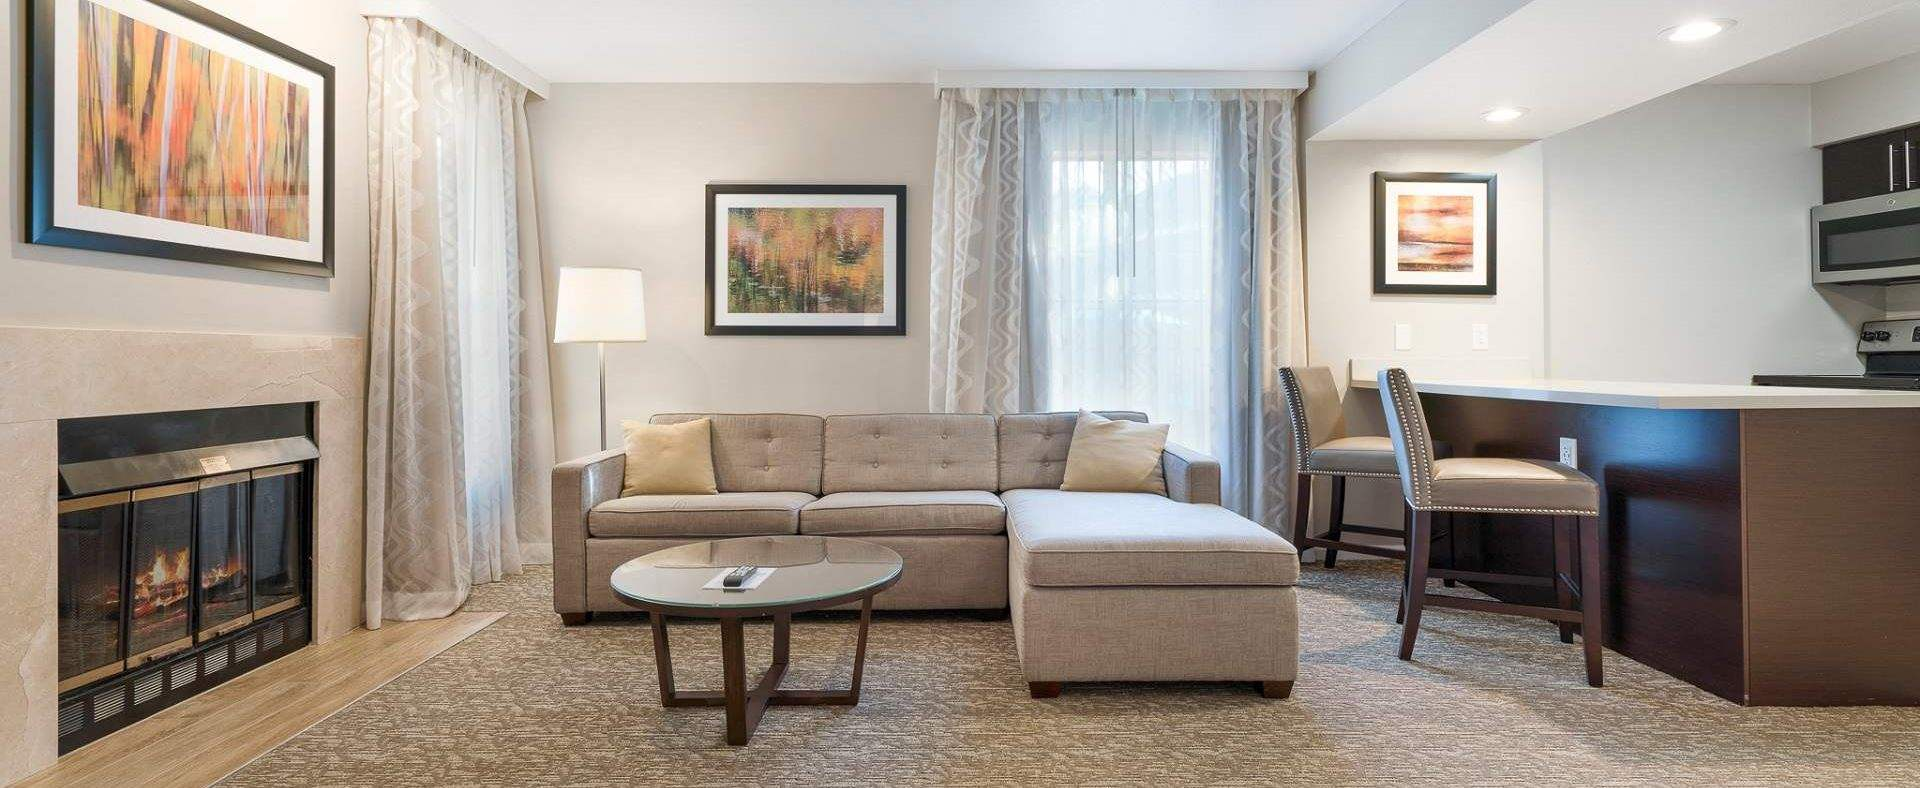 Chase Suite Hotel Newark California